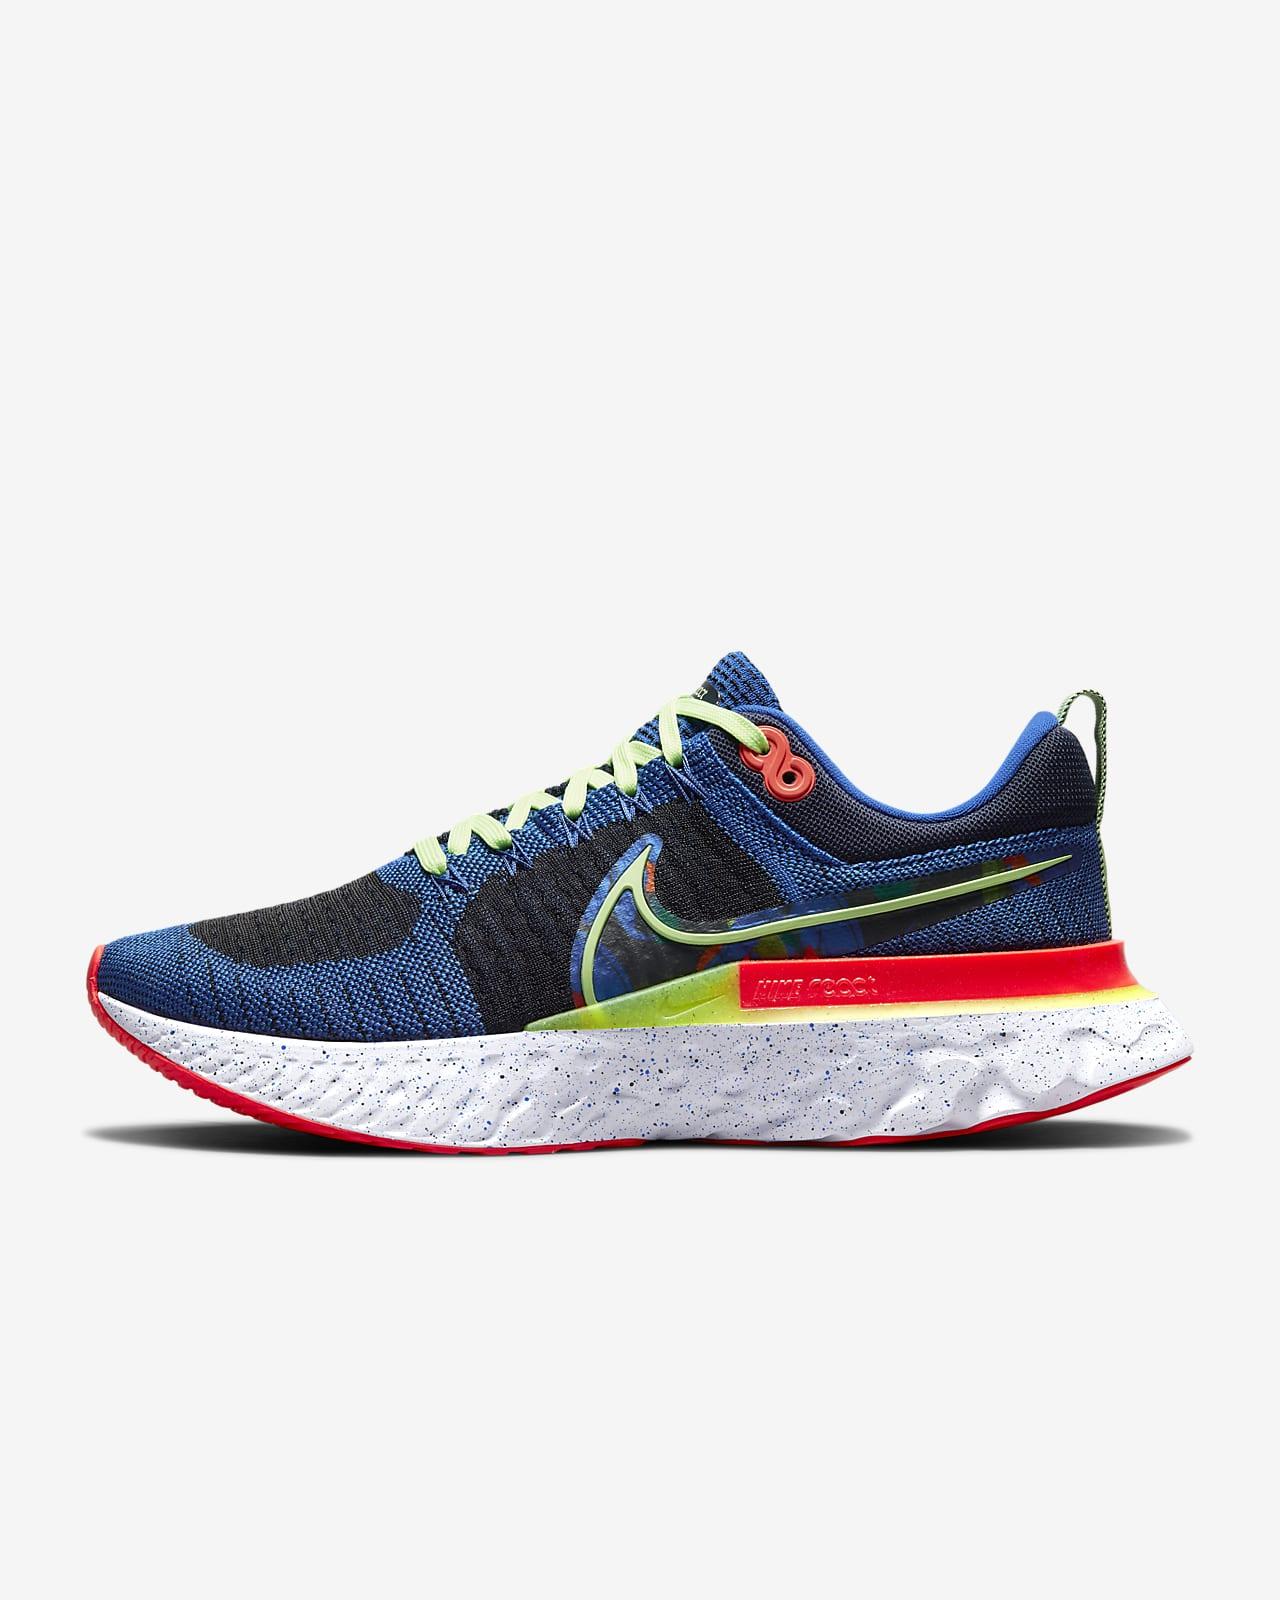 Nike React Infinity Run Flyknit 2 A.I.R. Kelly Anna London Men's Running Shoes